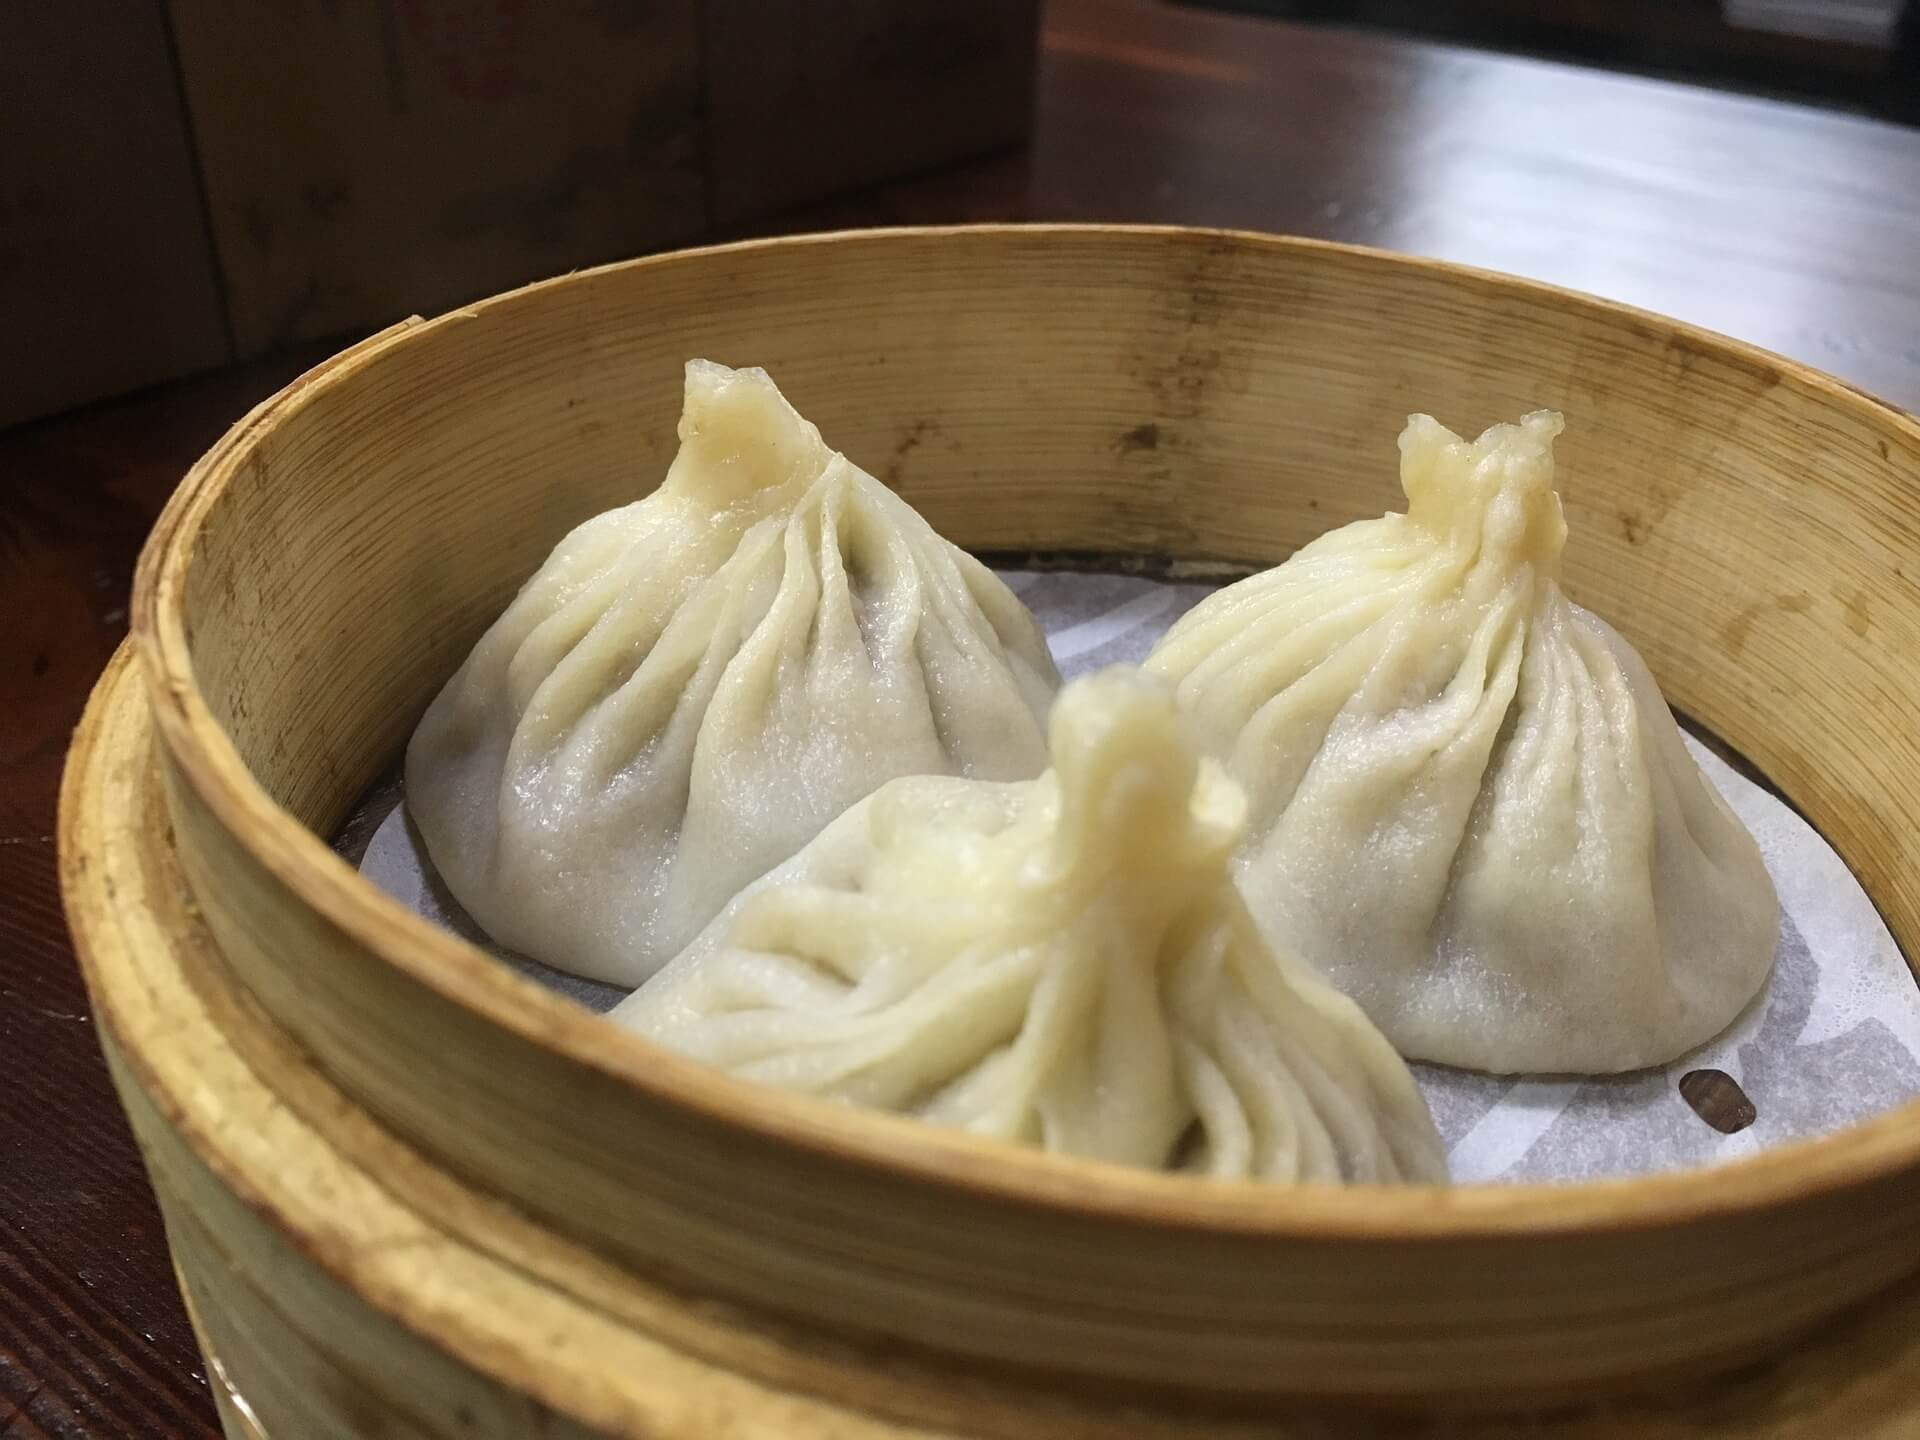 Dumplings 1204814 1920